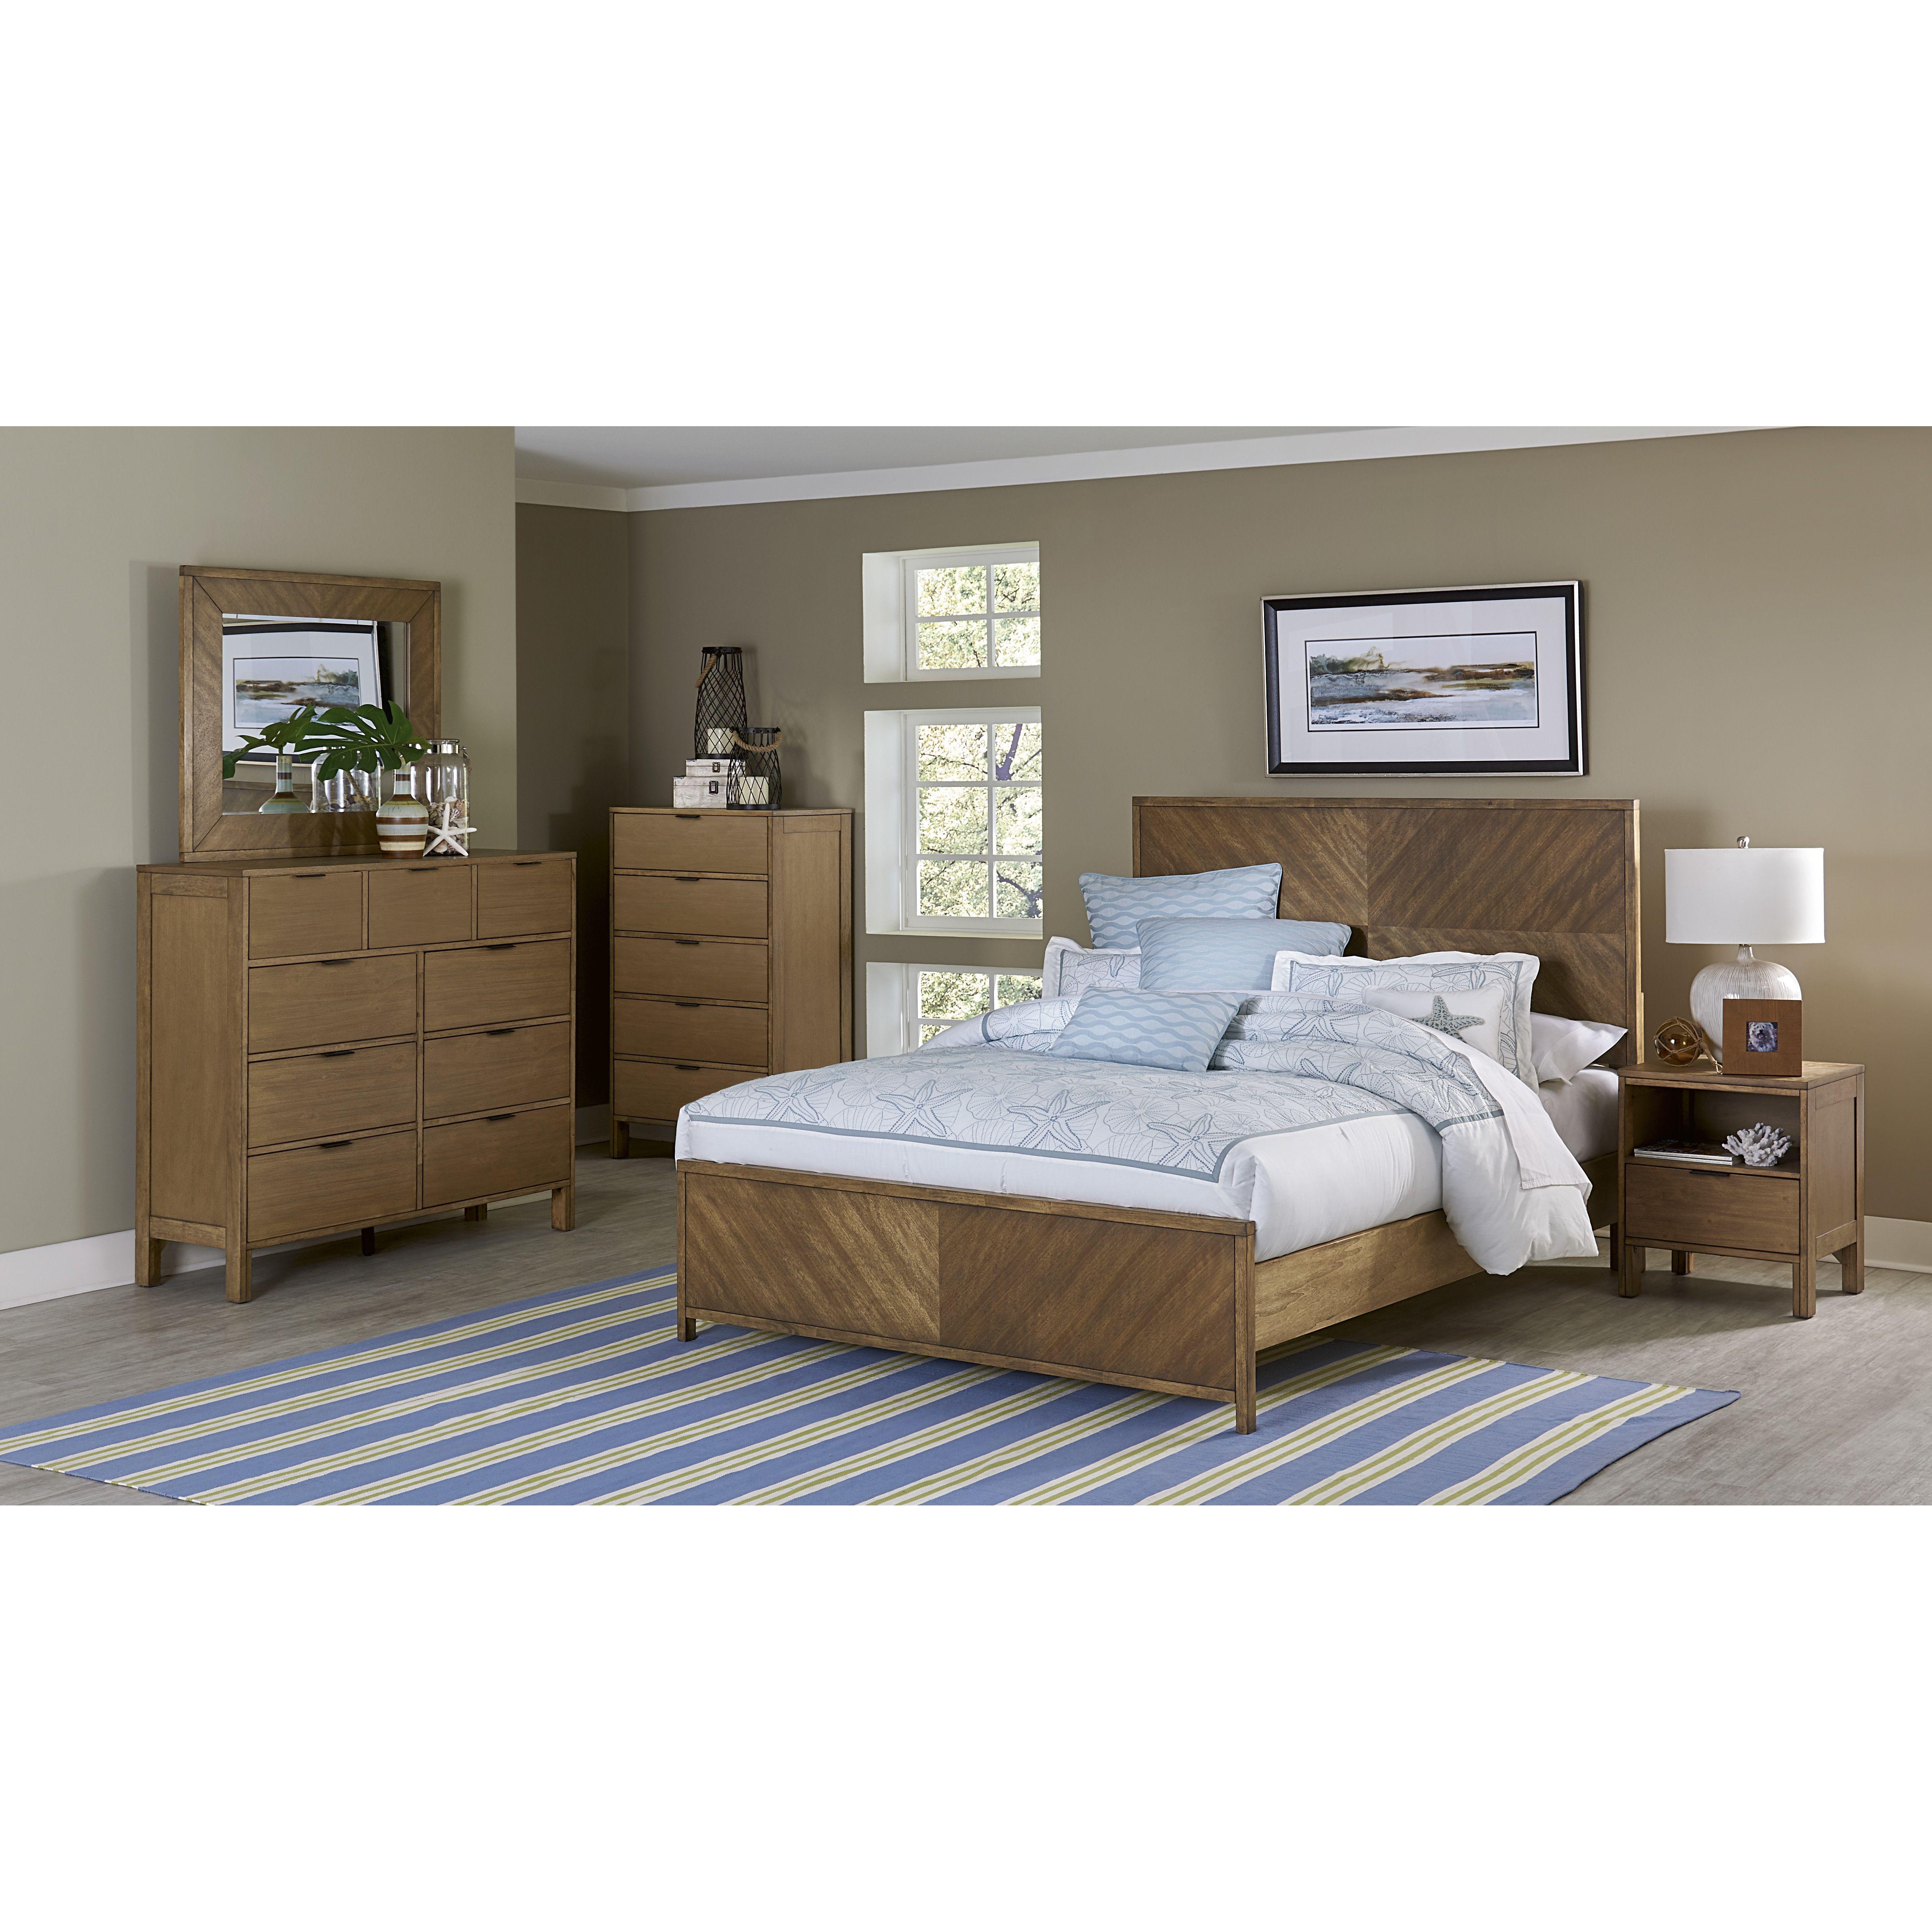 Delightful Progressive Furniture Inc. Strategy Panel Bed